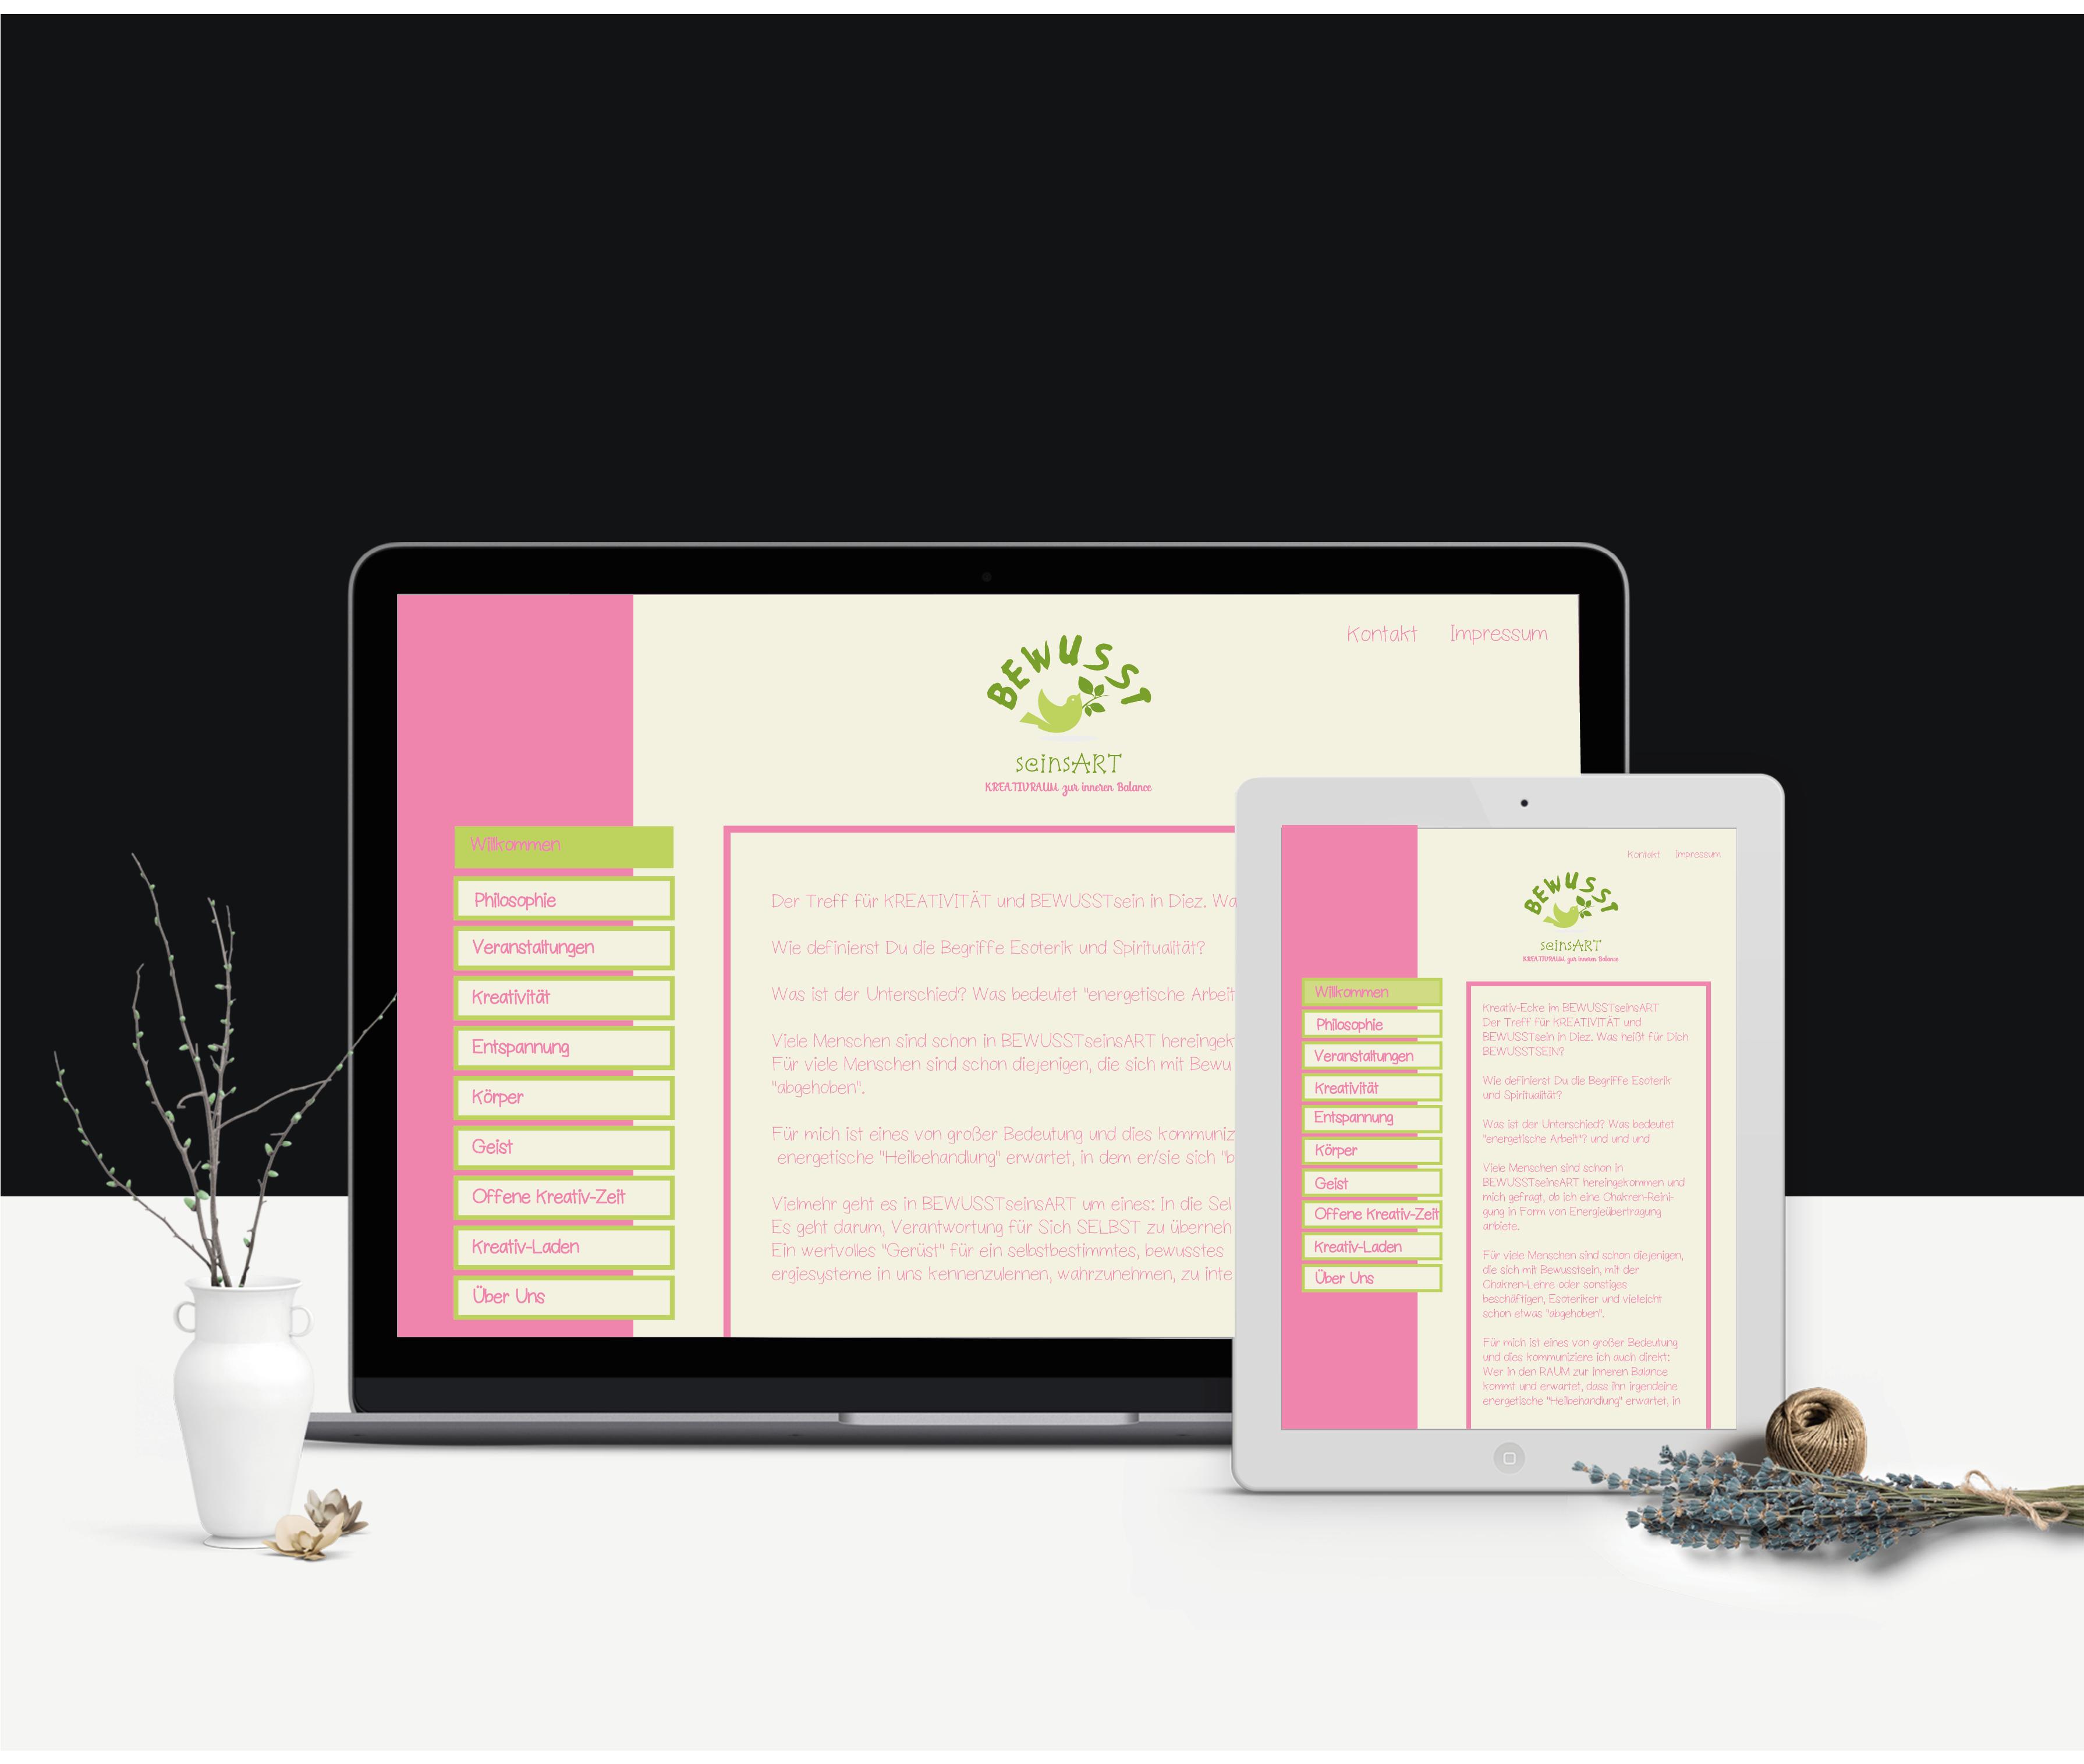 Webseite - Bewusstseinsart